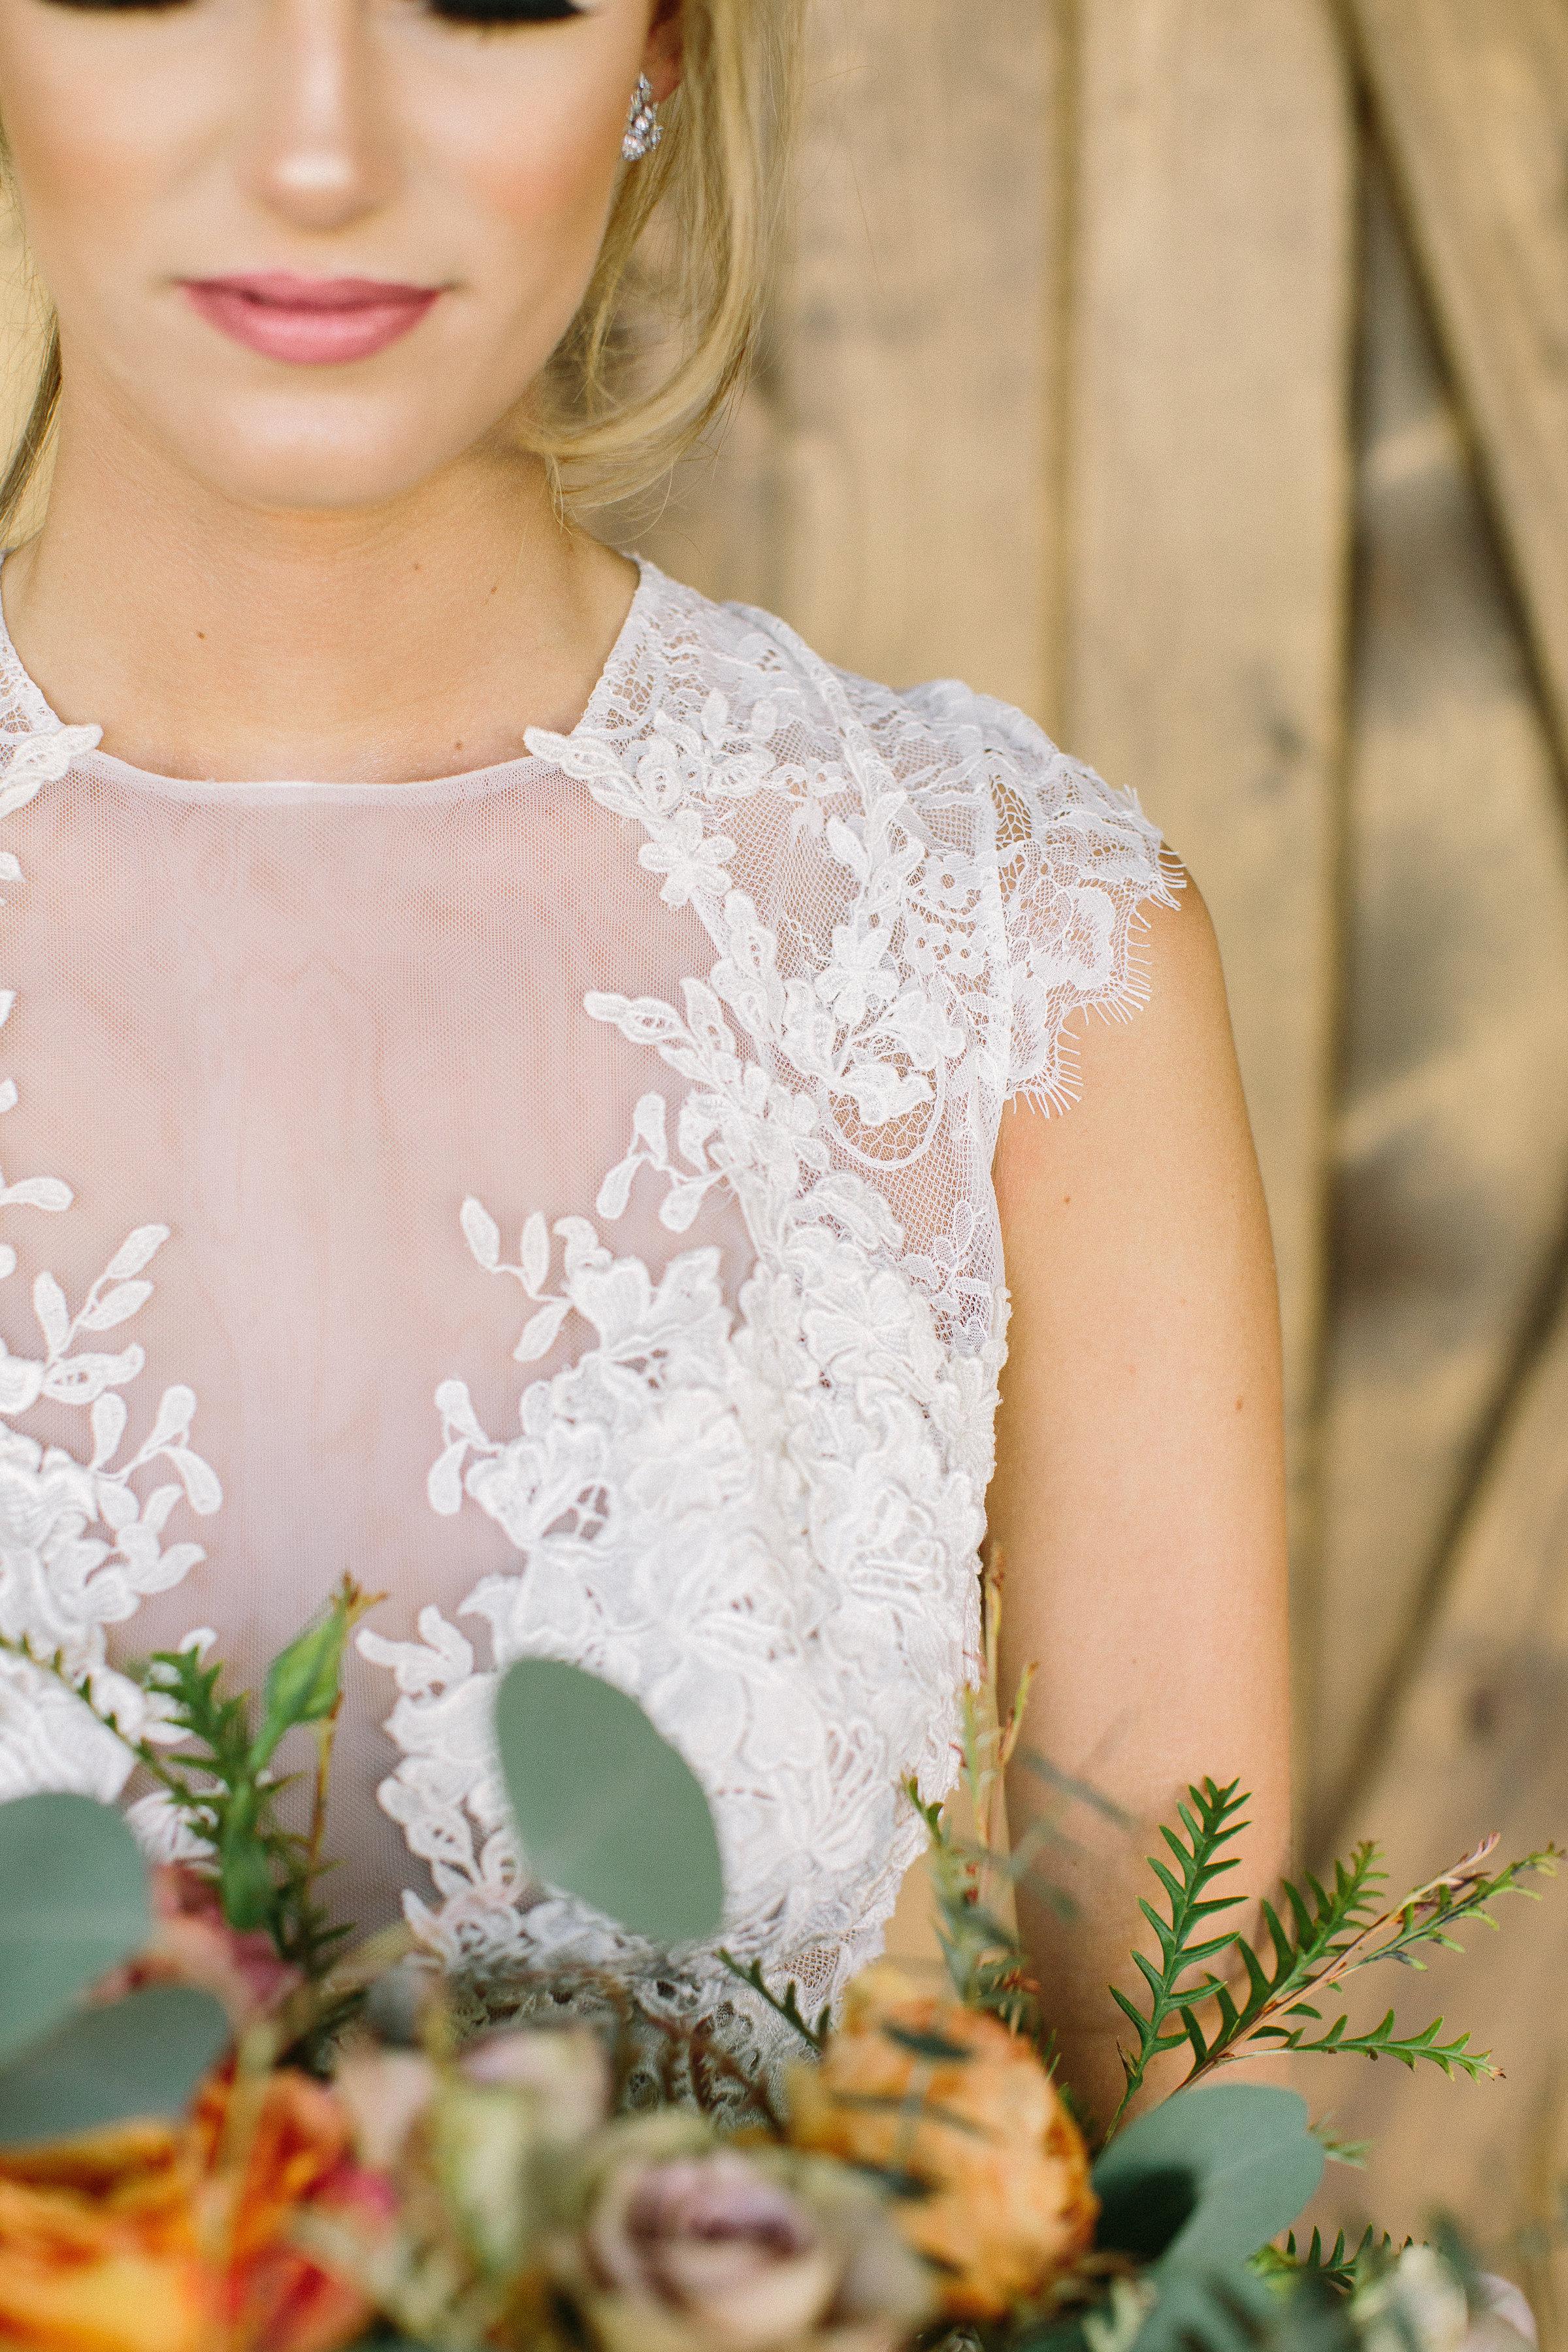 Ellen-Ashton-Photography-Peach-Creek-Ranch-Weddings-Wed-and-Prosper52.jpg